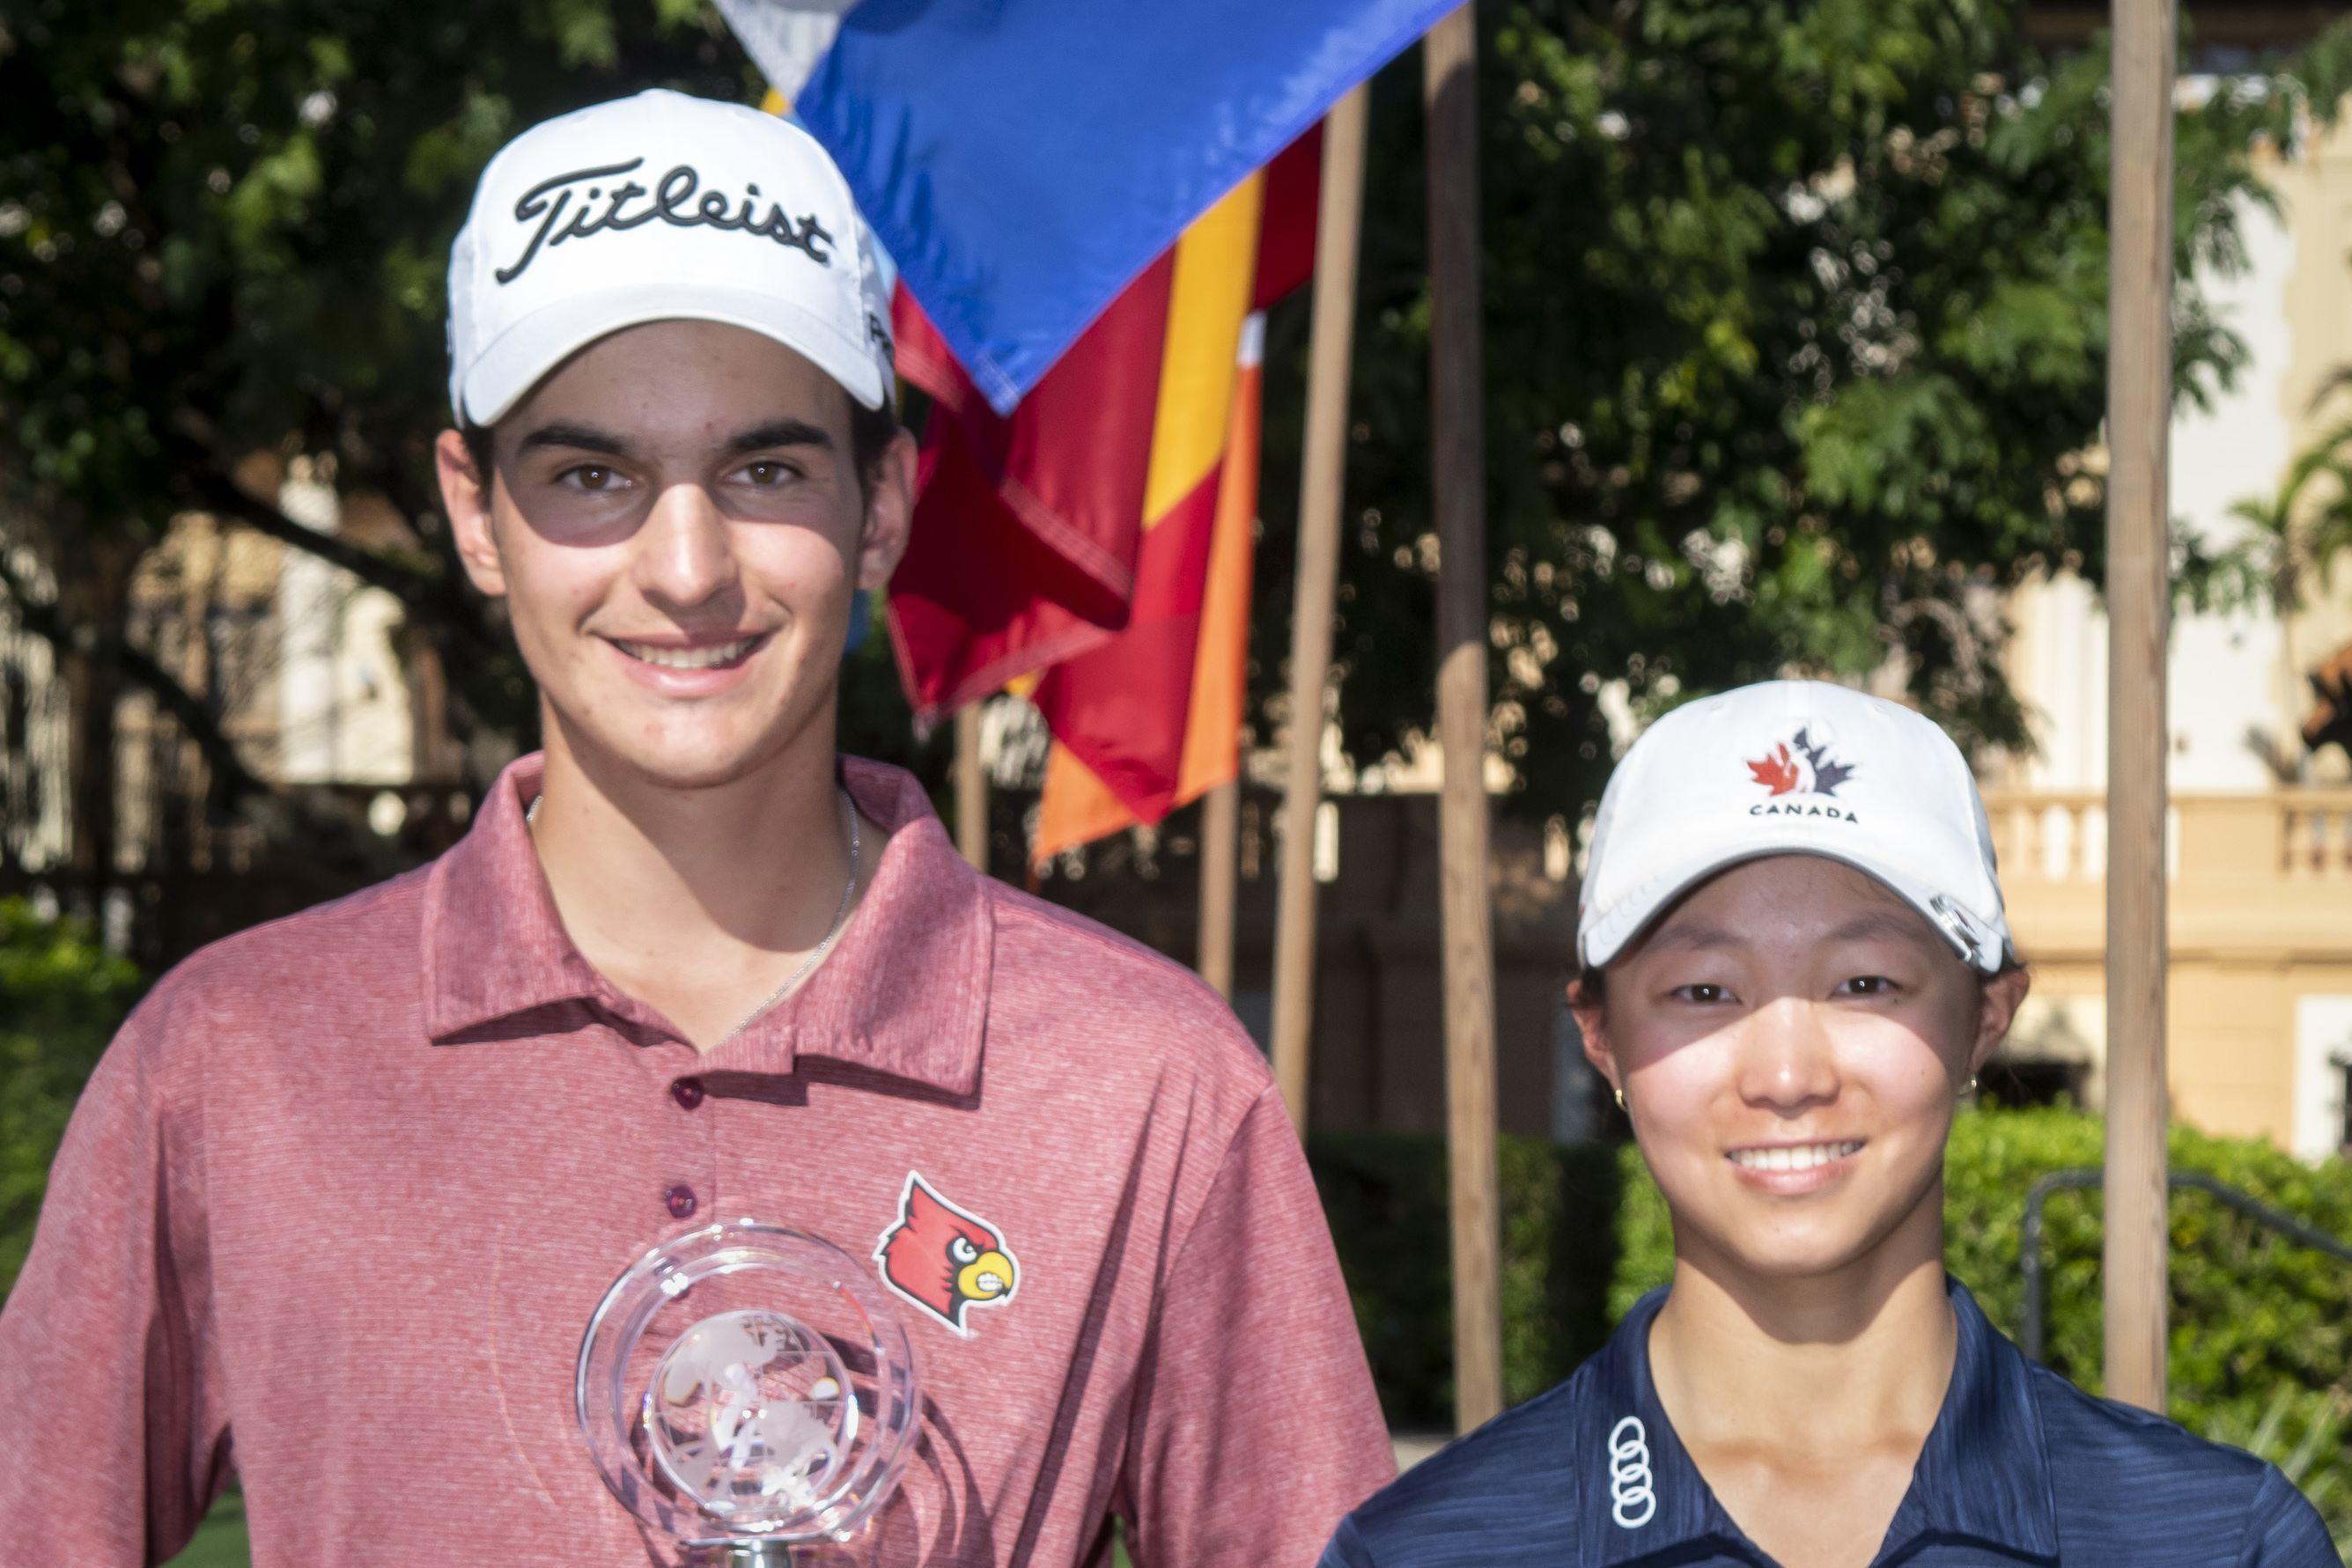 57th Annual Junior Orange Bowl International Golf Championship